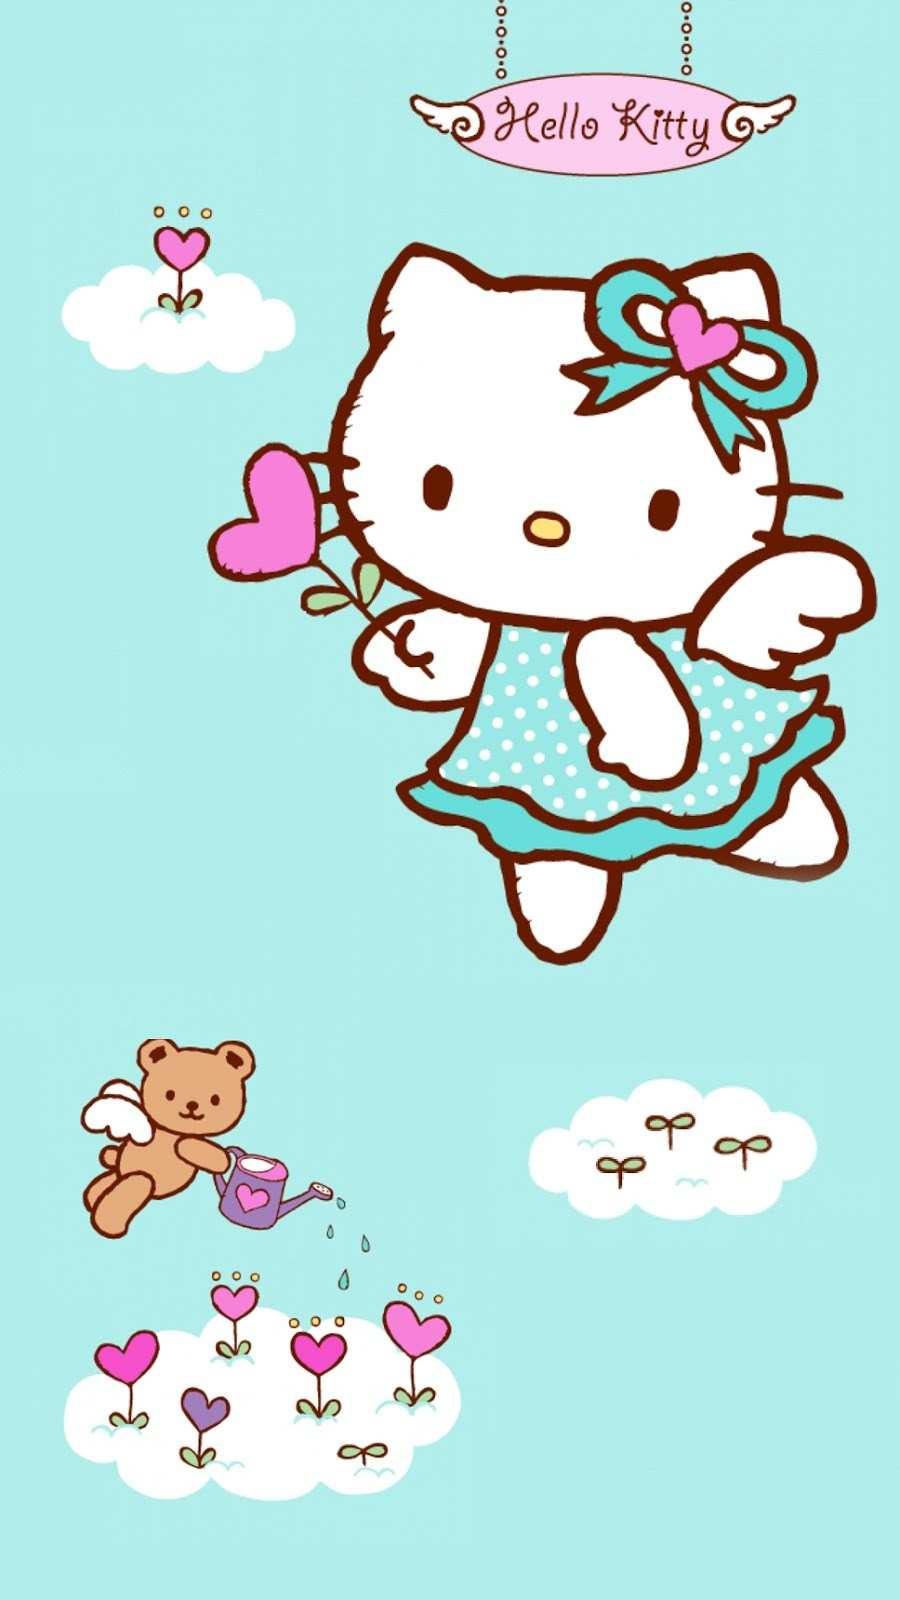 Gambar Wallpaper Hello Kitty Untuk Android 15 Gambar 900x1600 Download Hd Wallpaper Wallpapertip